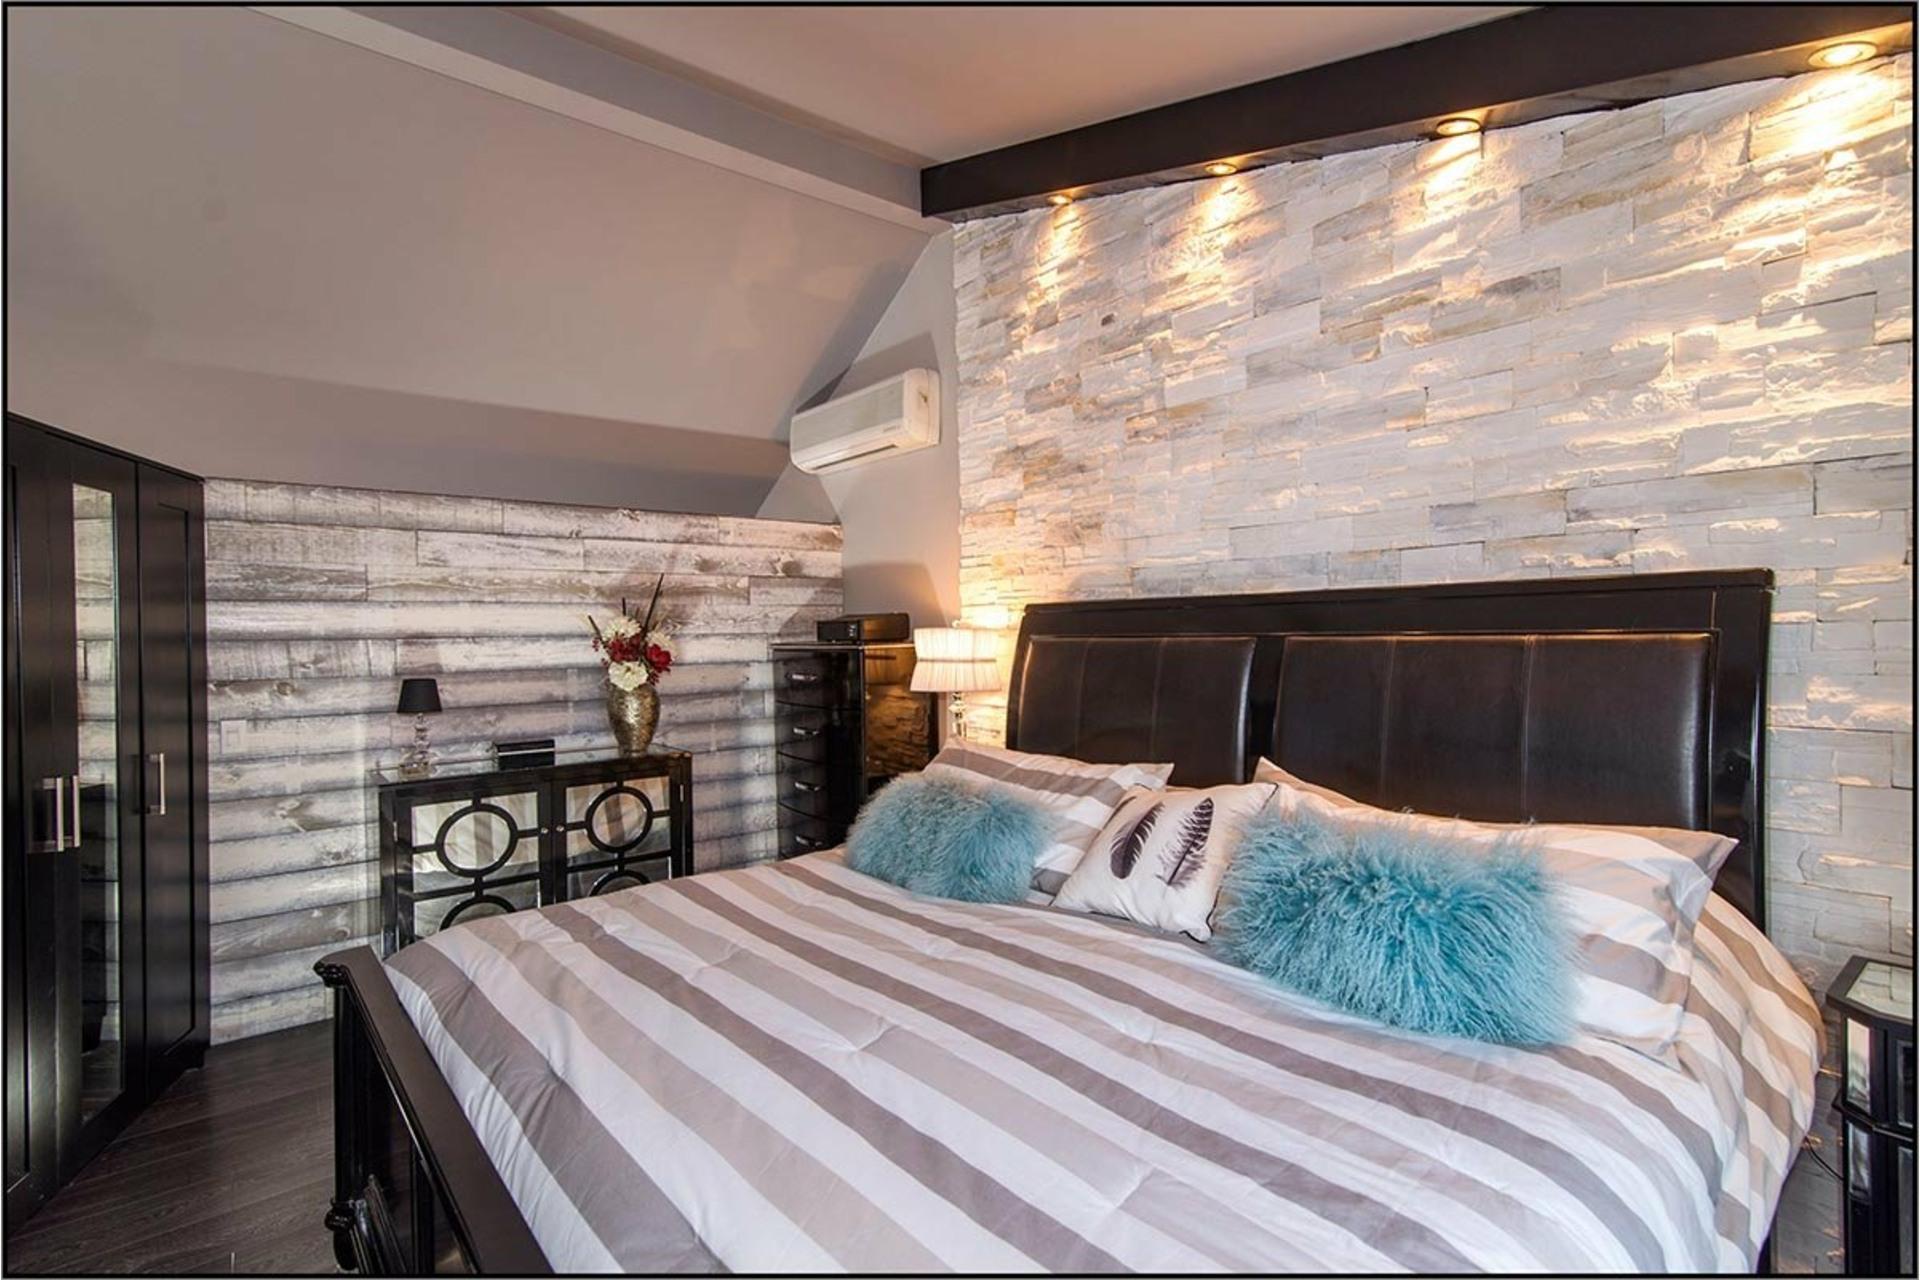 image 8 - House For sale Sainte-Foy/Sillery/Cap-Rouge Québec  - 13 rooms